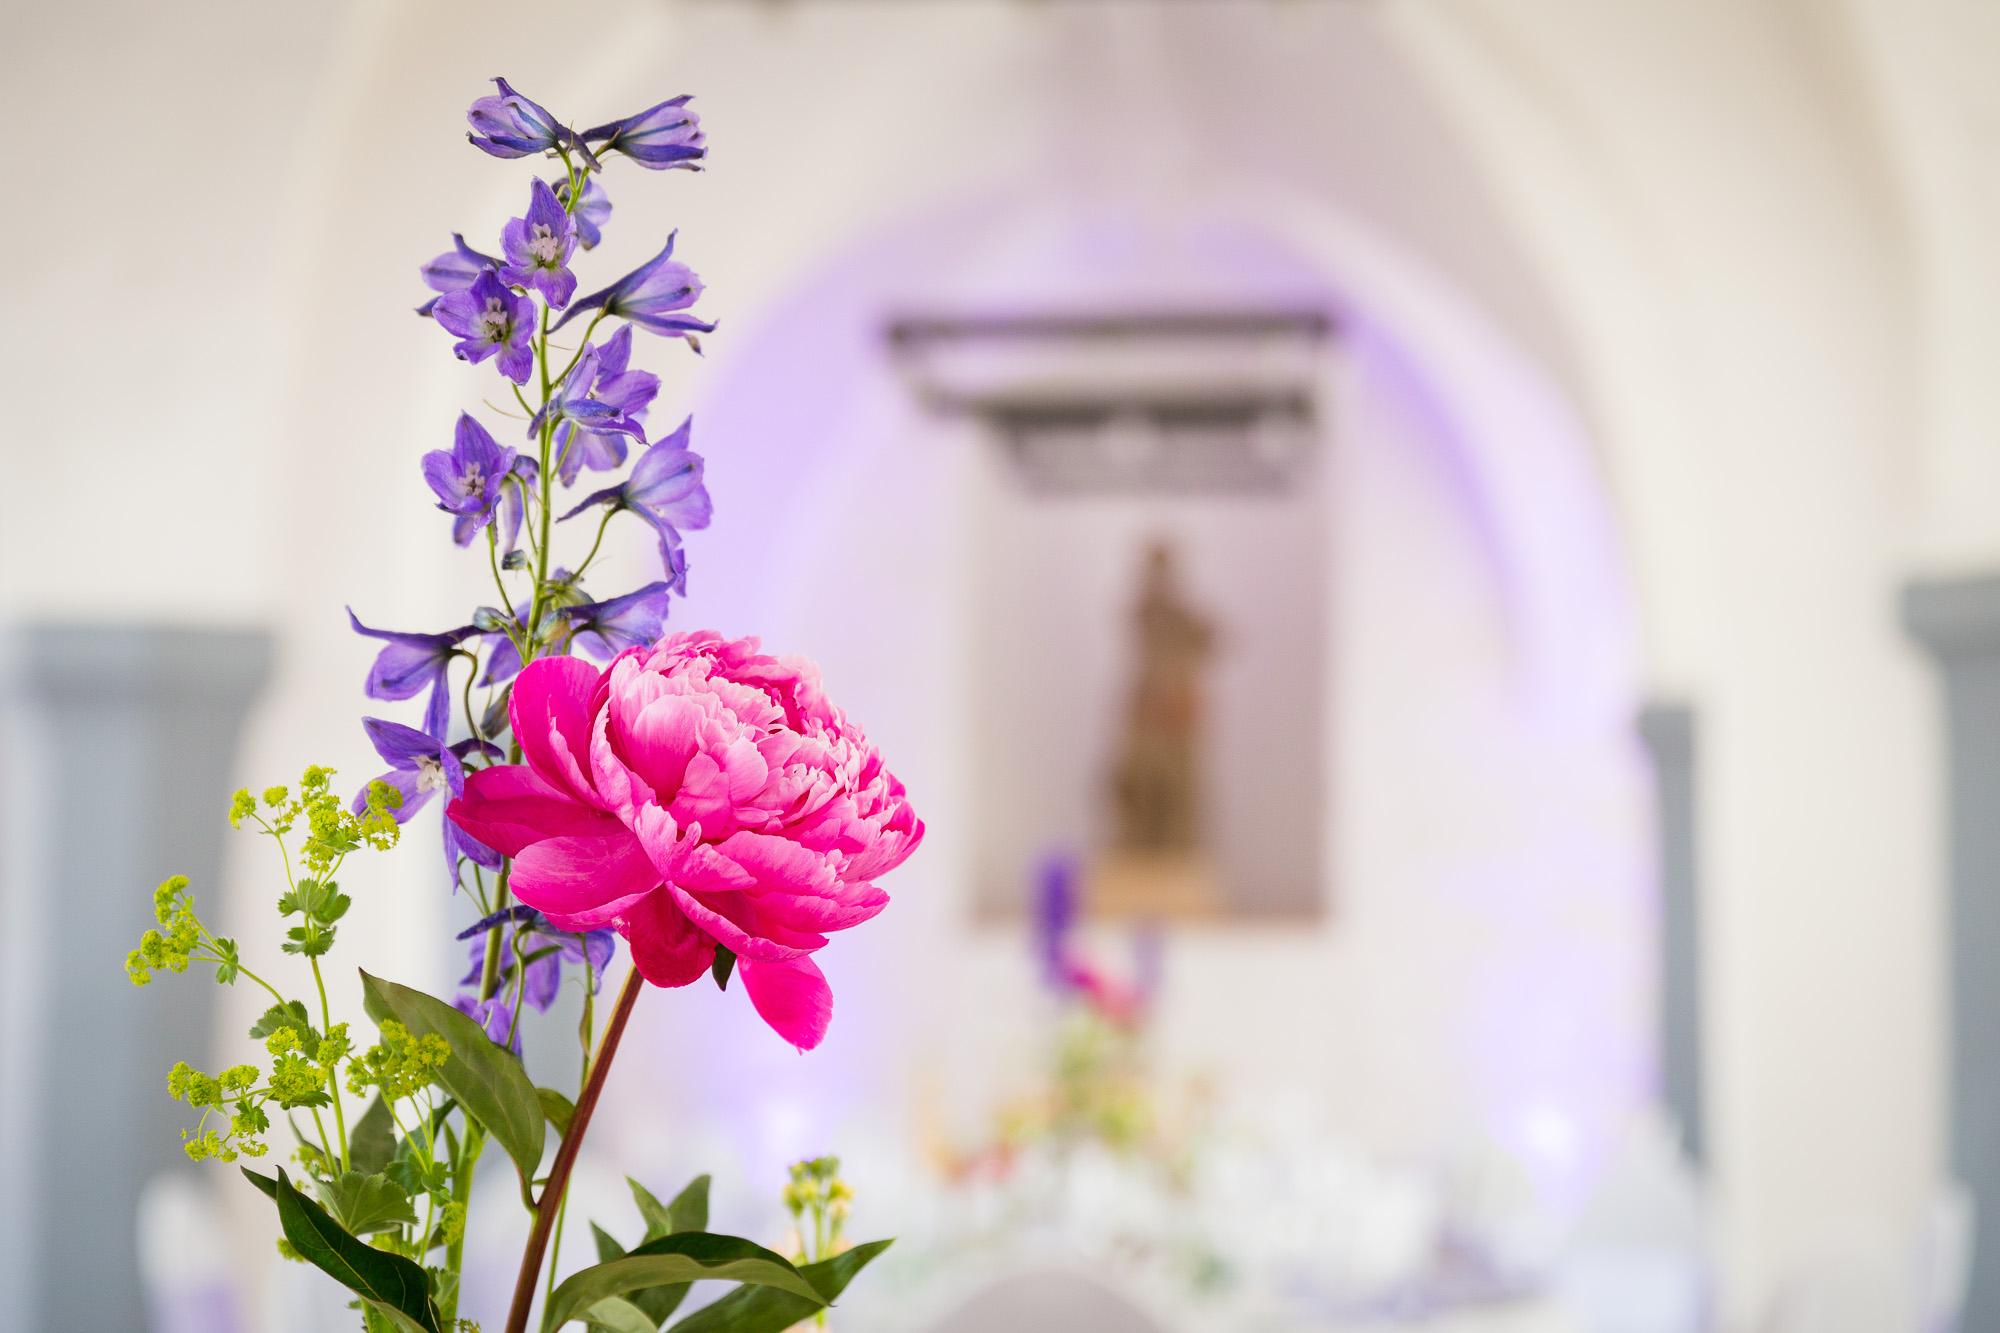 Hochzeitsfotograf im Landgrafenschloss Butzbach | © Andreas Bender